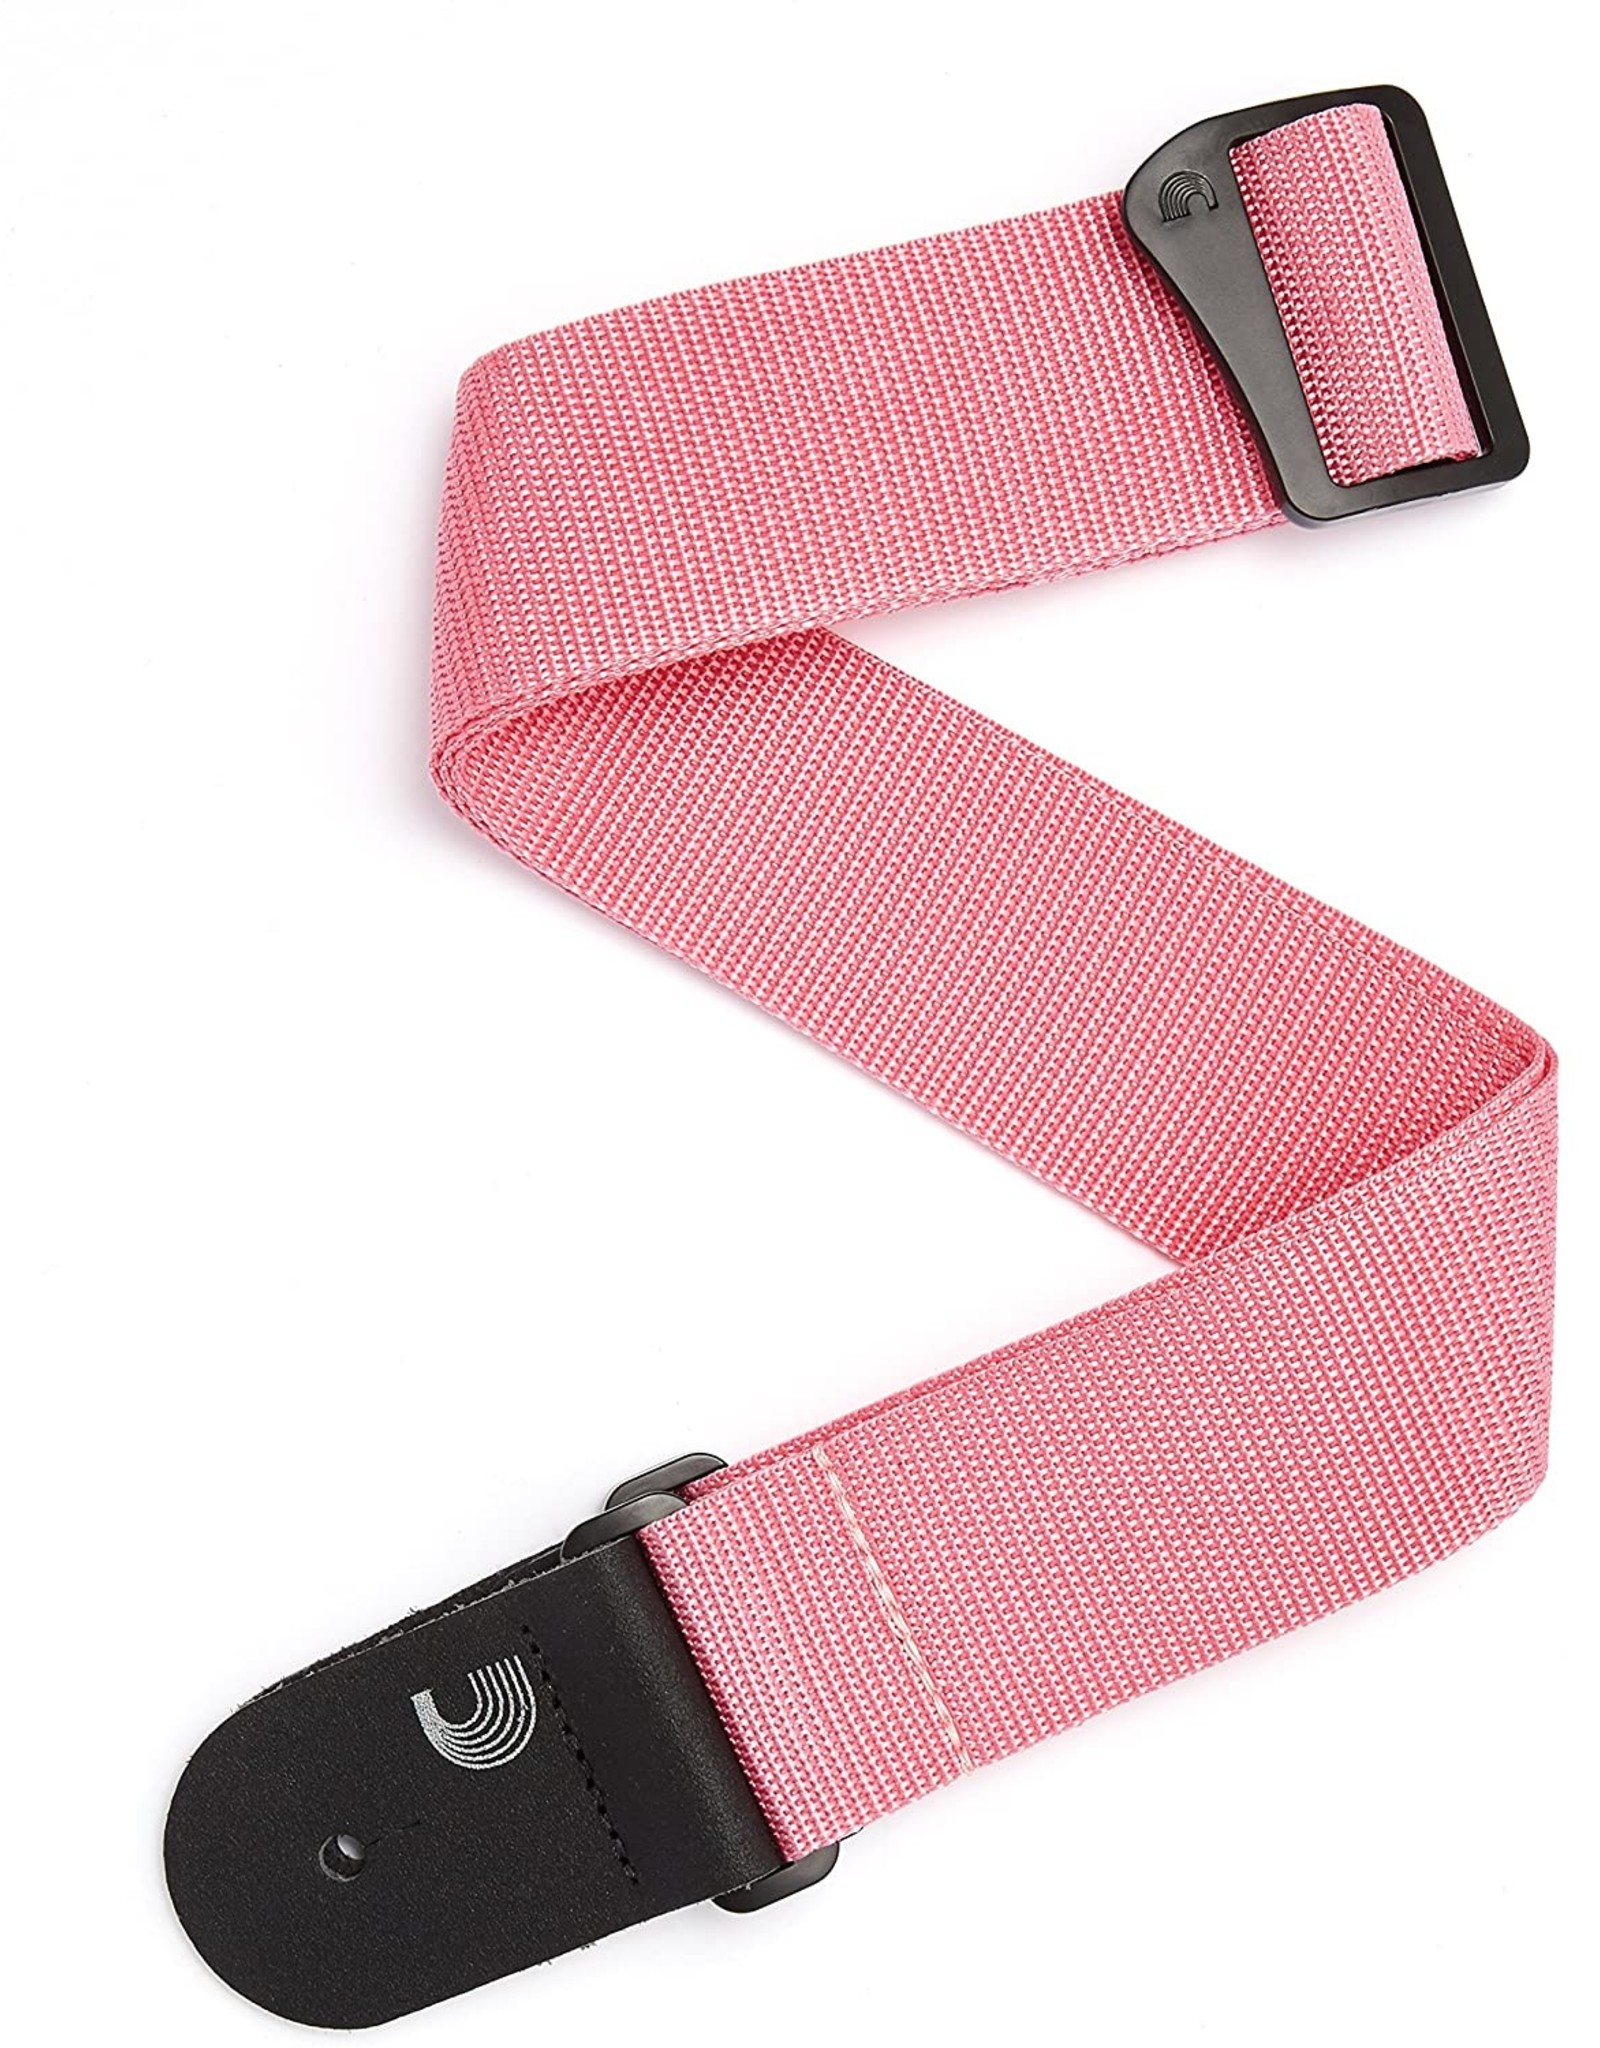 D'Addario 50MM Polypropylene Strap Pink